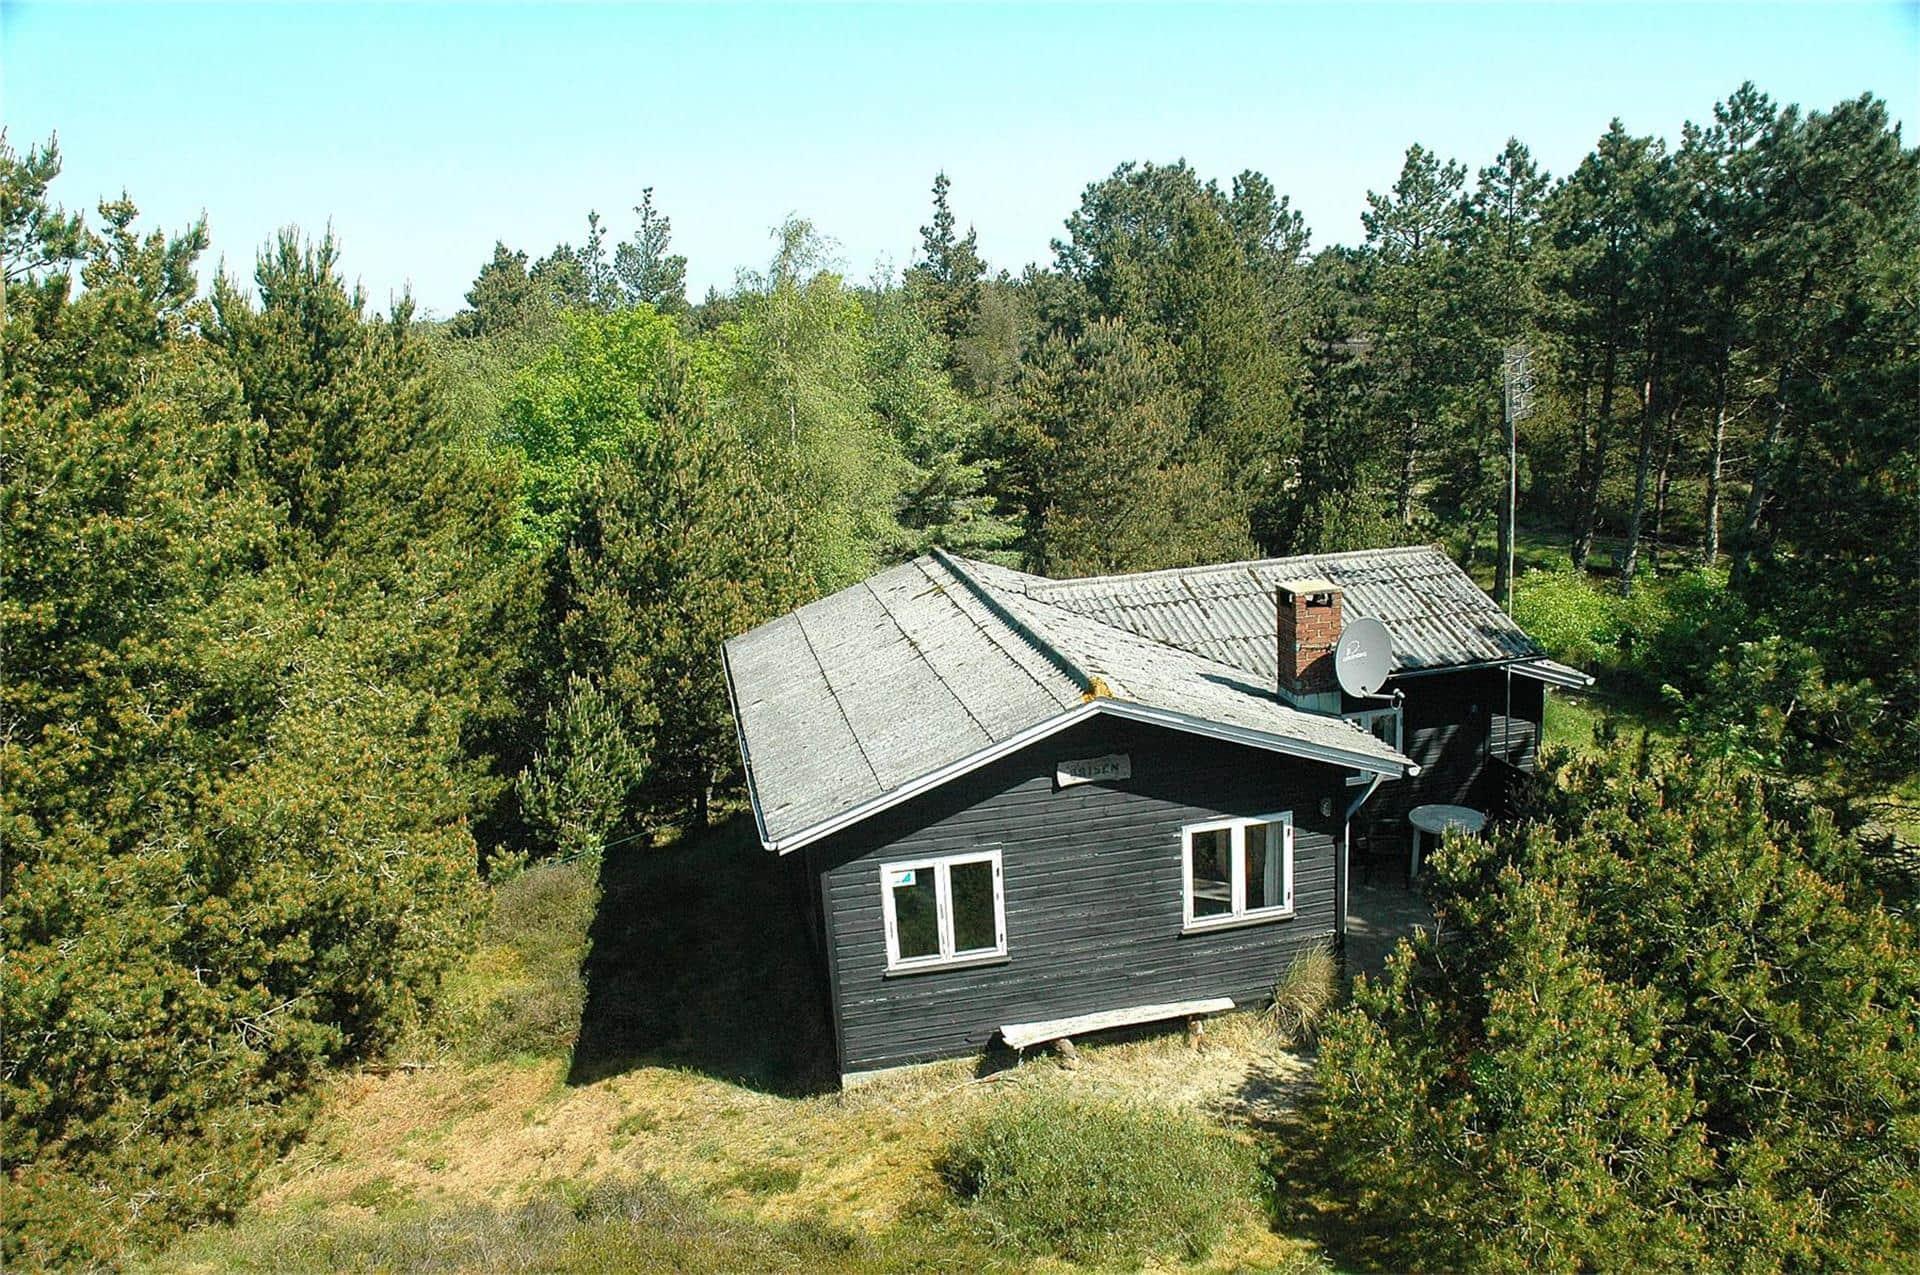 Afbeelding 1-11 Vakantiehuis 0231, A Hansensvej 7, DK - 6792 Rømø